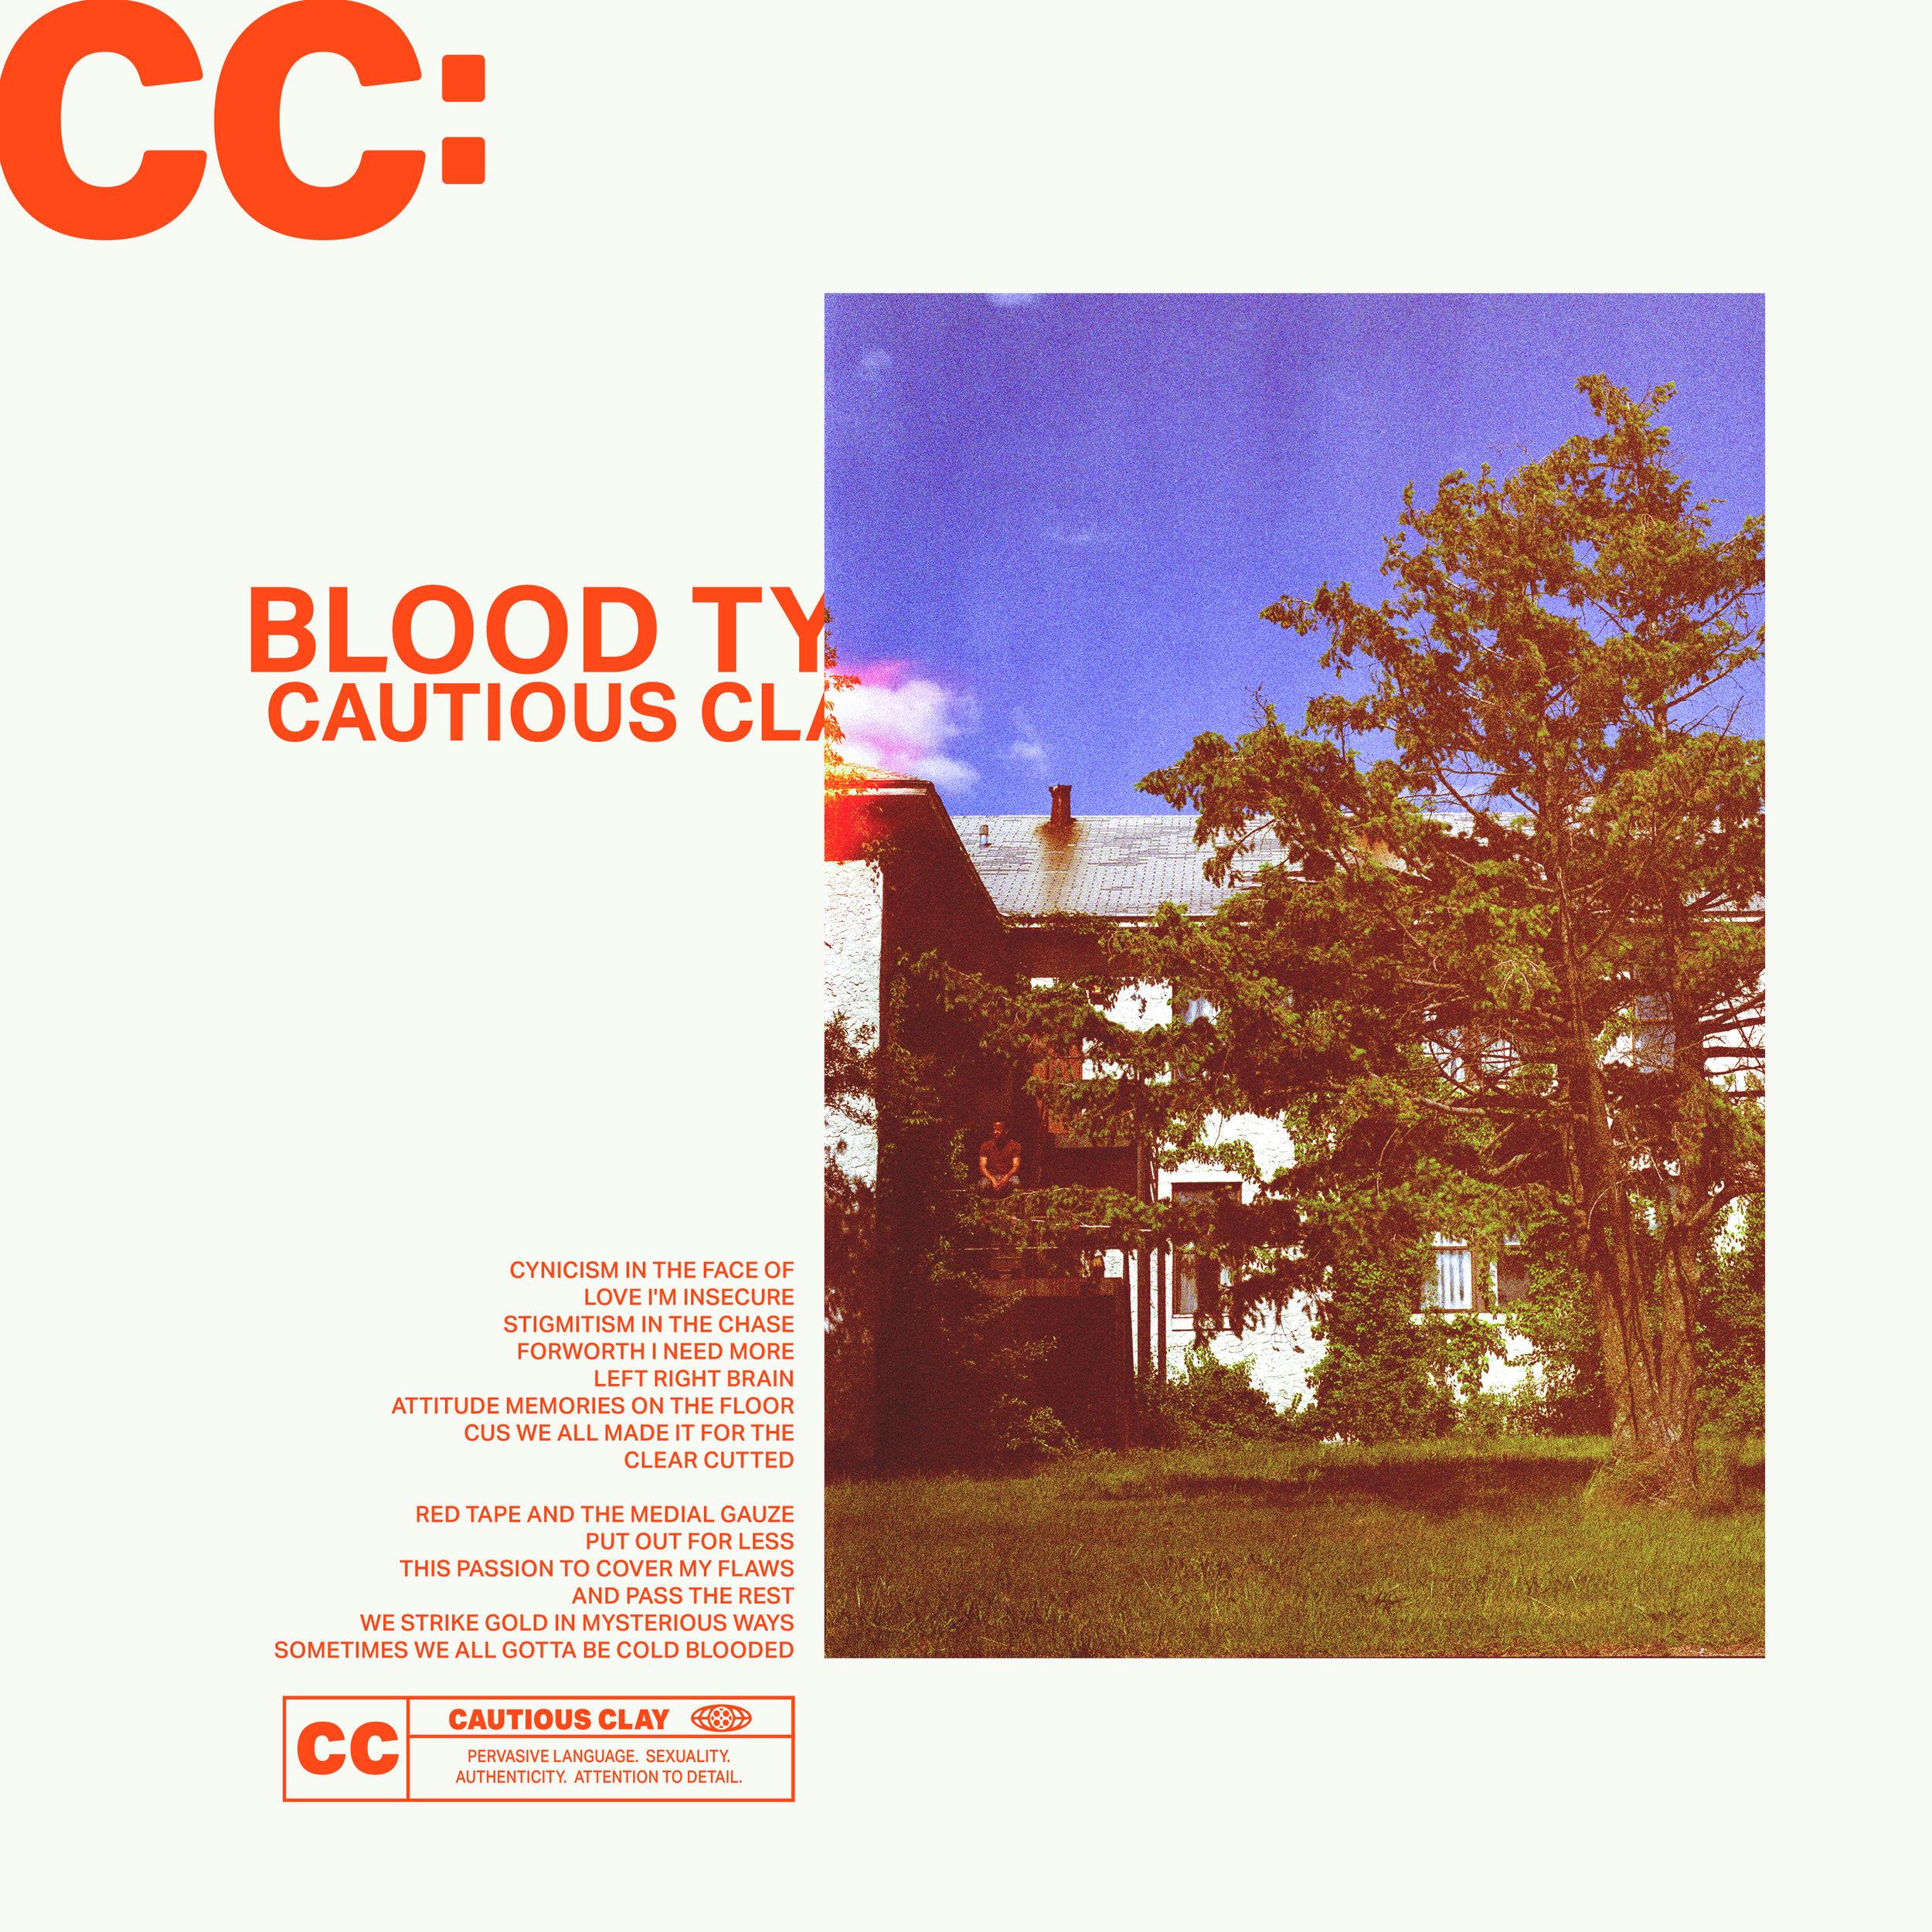 BLOOD TYPE FINAL.jpg